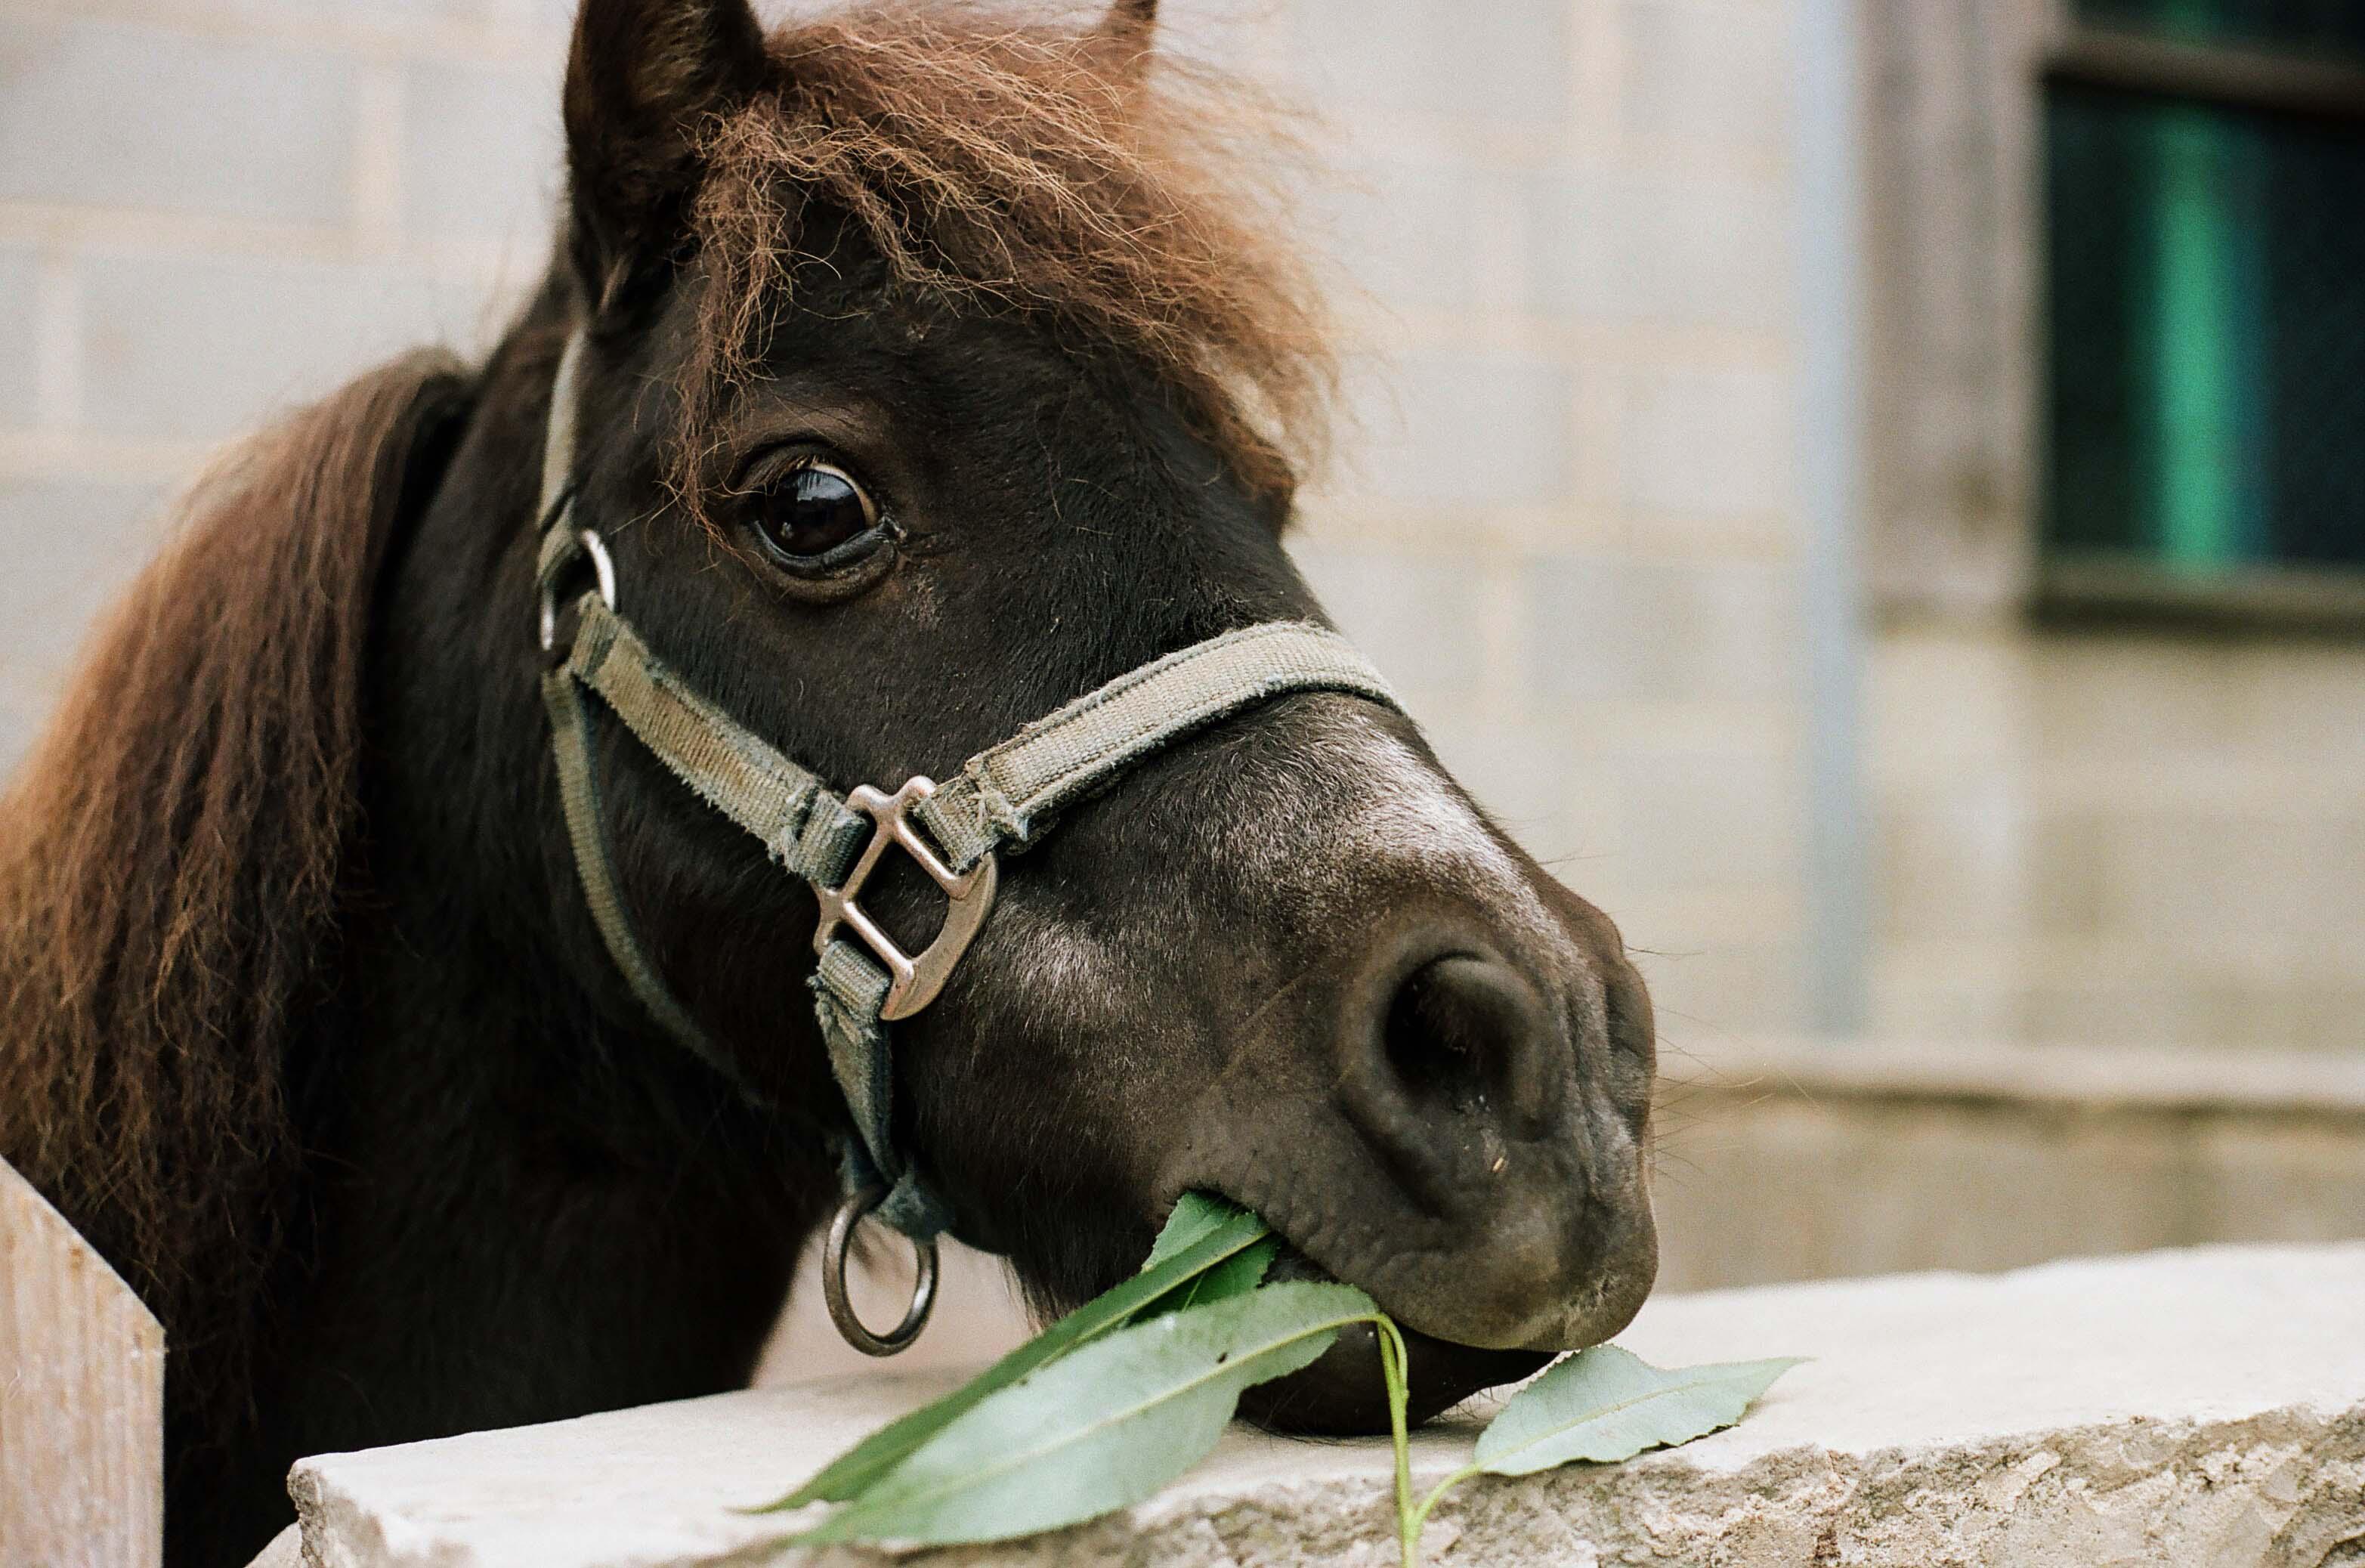 Lucky, the Pony